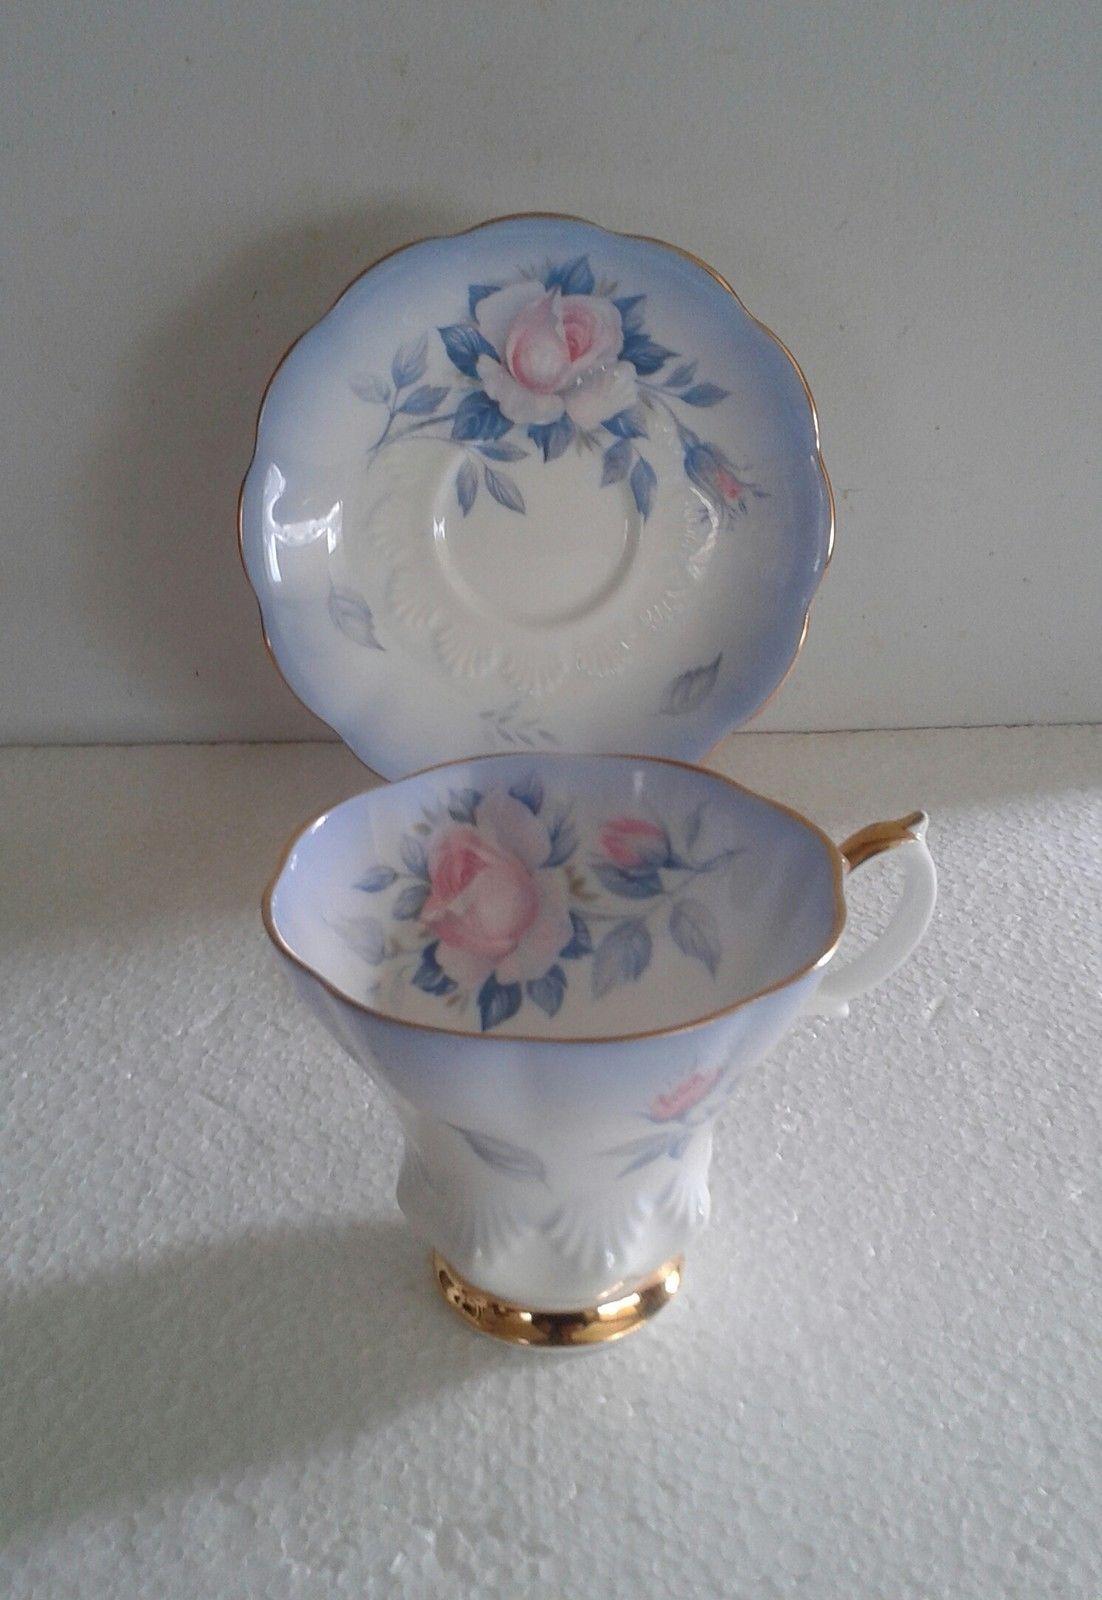 Royal albert bone china tea cup amp saucer winsome pattern ebay - Stunning Royal Albert Sky Blue Large Pink Rose Tea Cup And Saucer Set Ebay